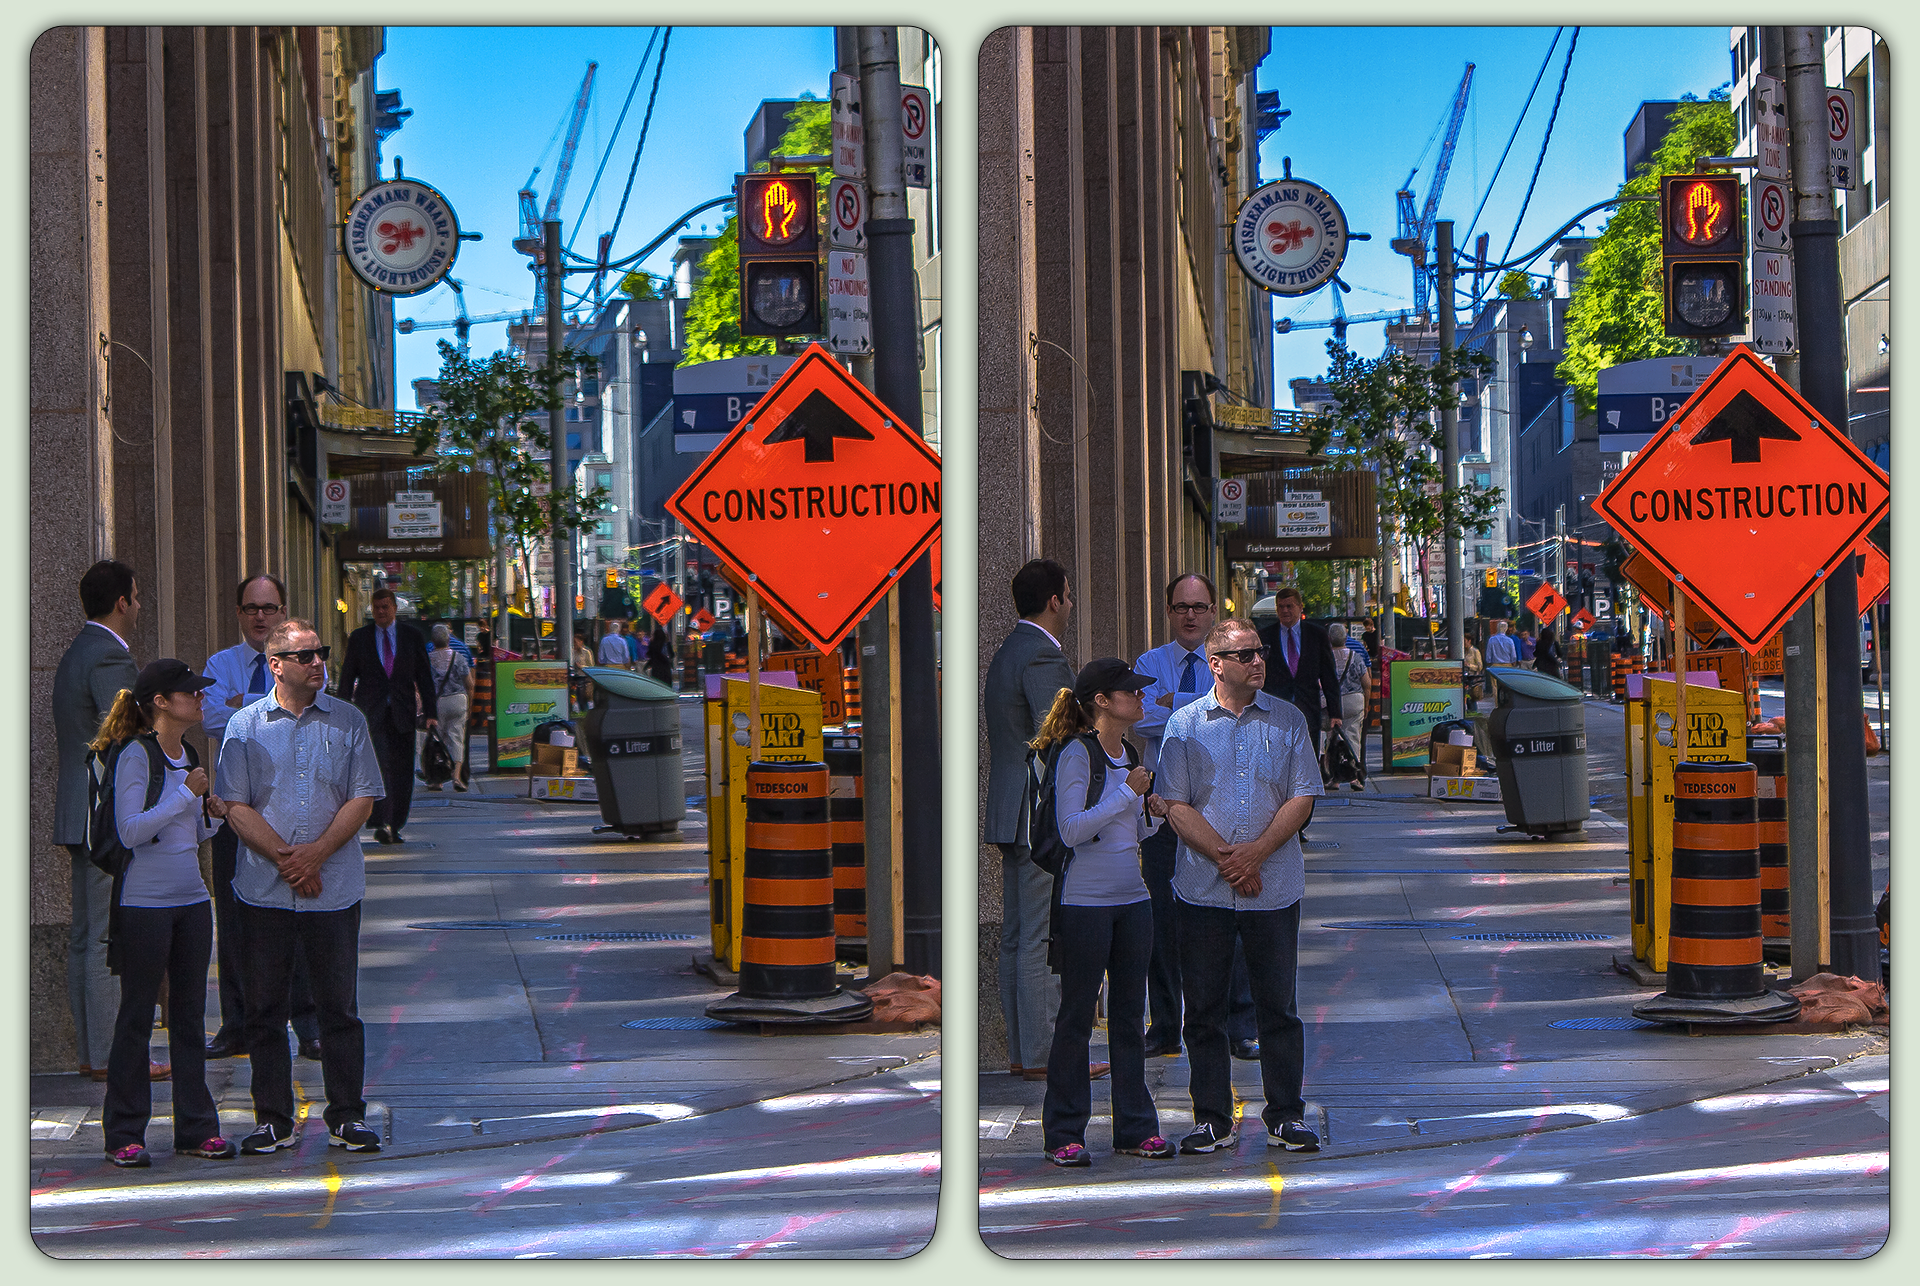 Toronto street scene 3-D / CrossView / Stereoscopy by zour